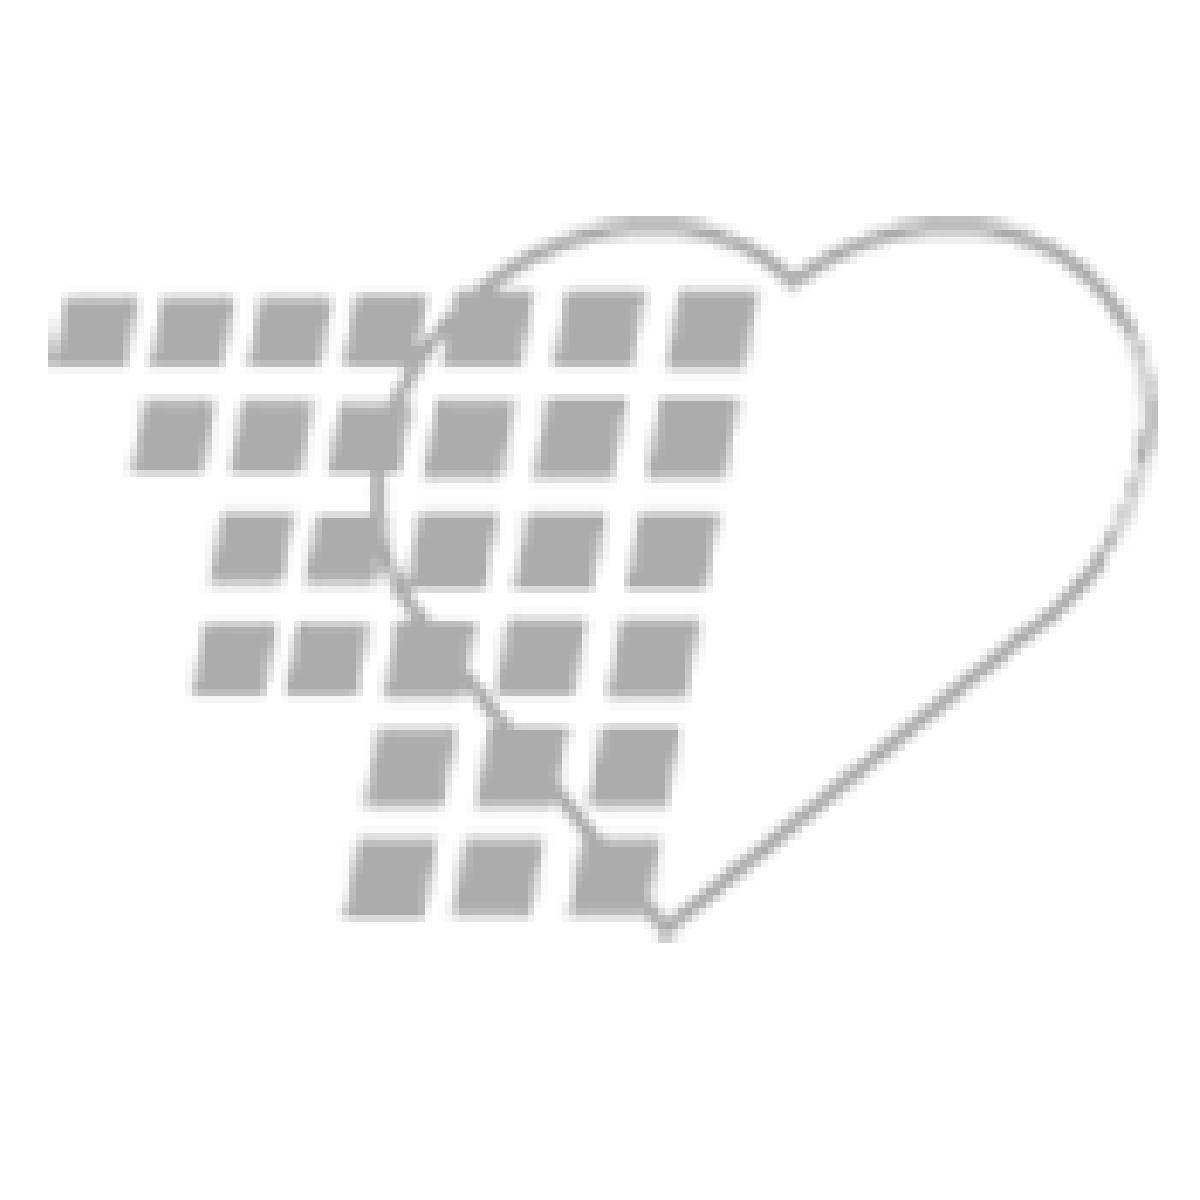 02-70-4080-INFNT - Laryngoscope Miller Blade #1